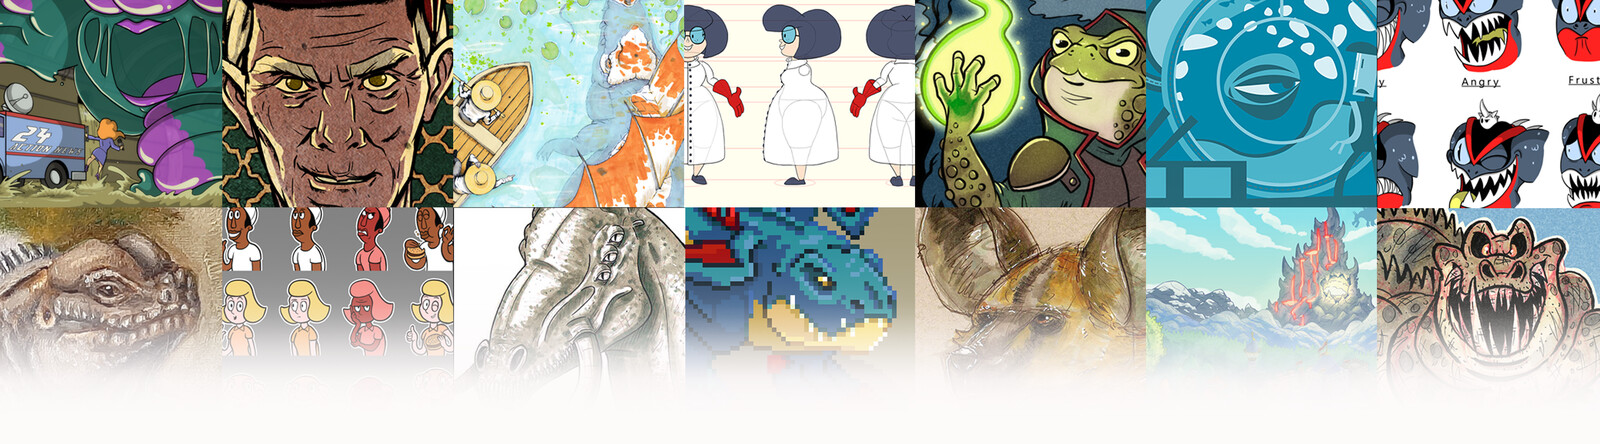 Molly Heady-Carroll: Visual Development and Character Design